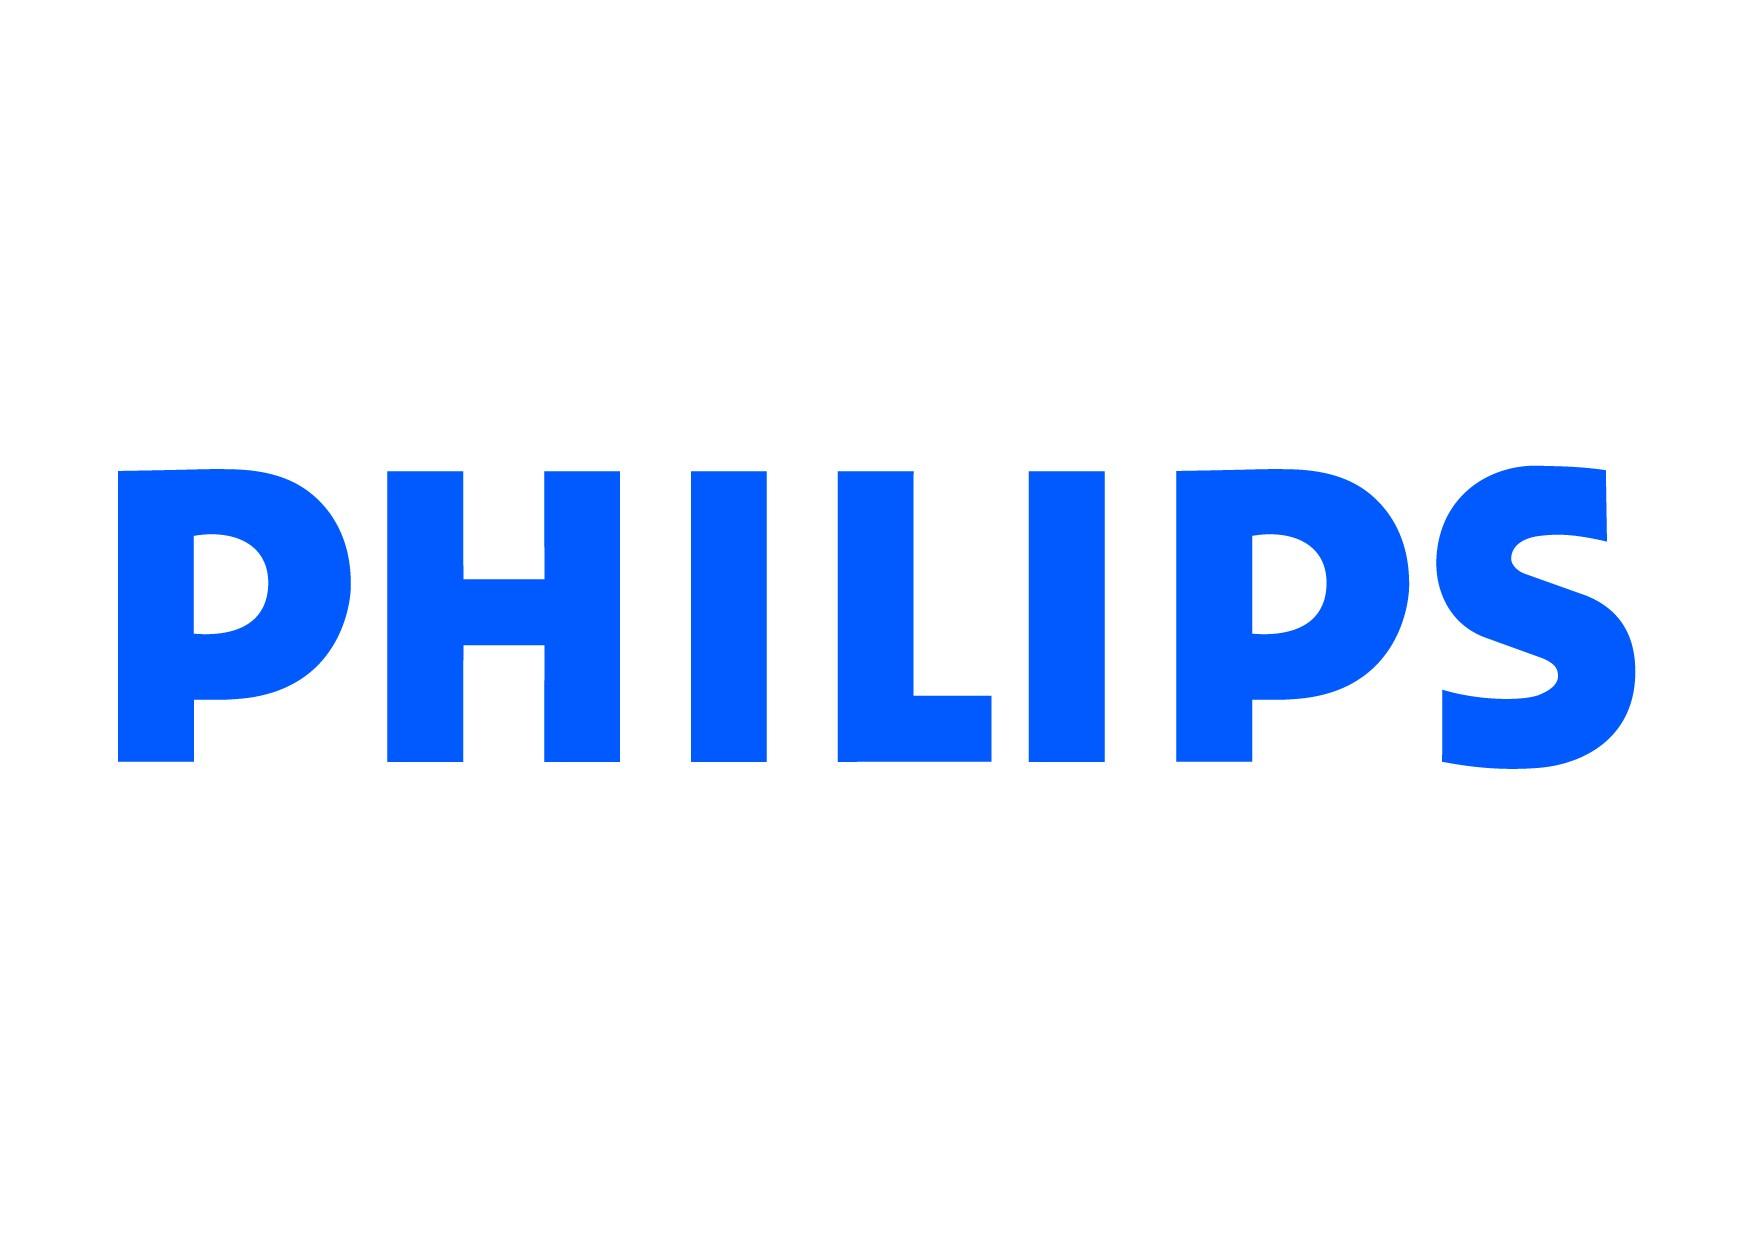 Philips 飞利浦 标志 数码多高清图片